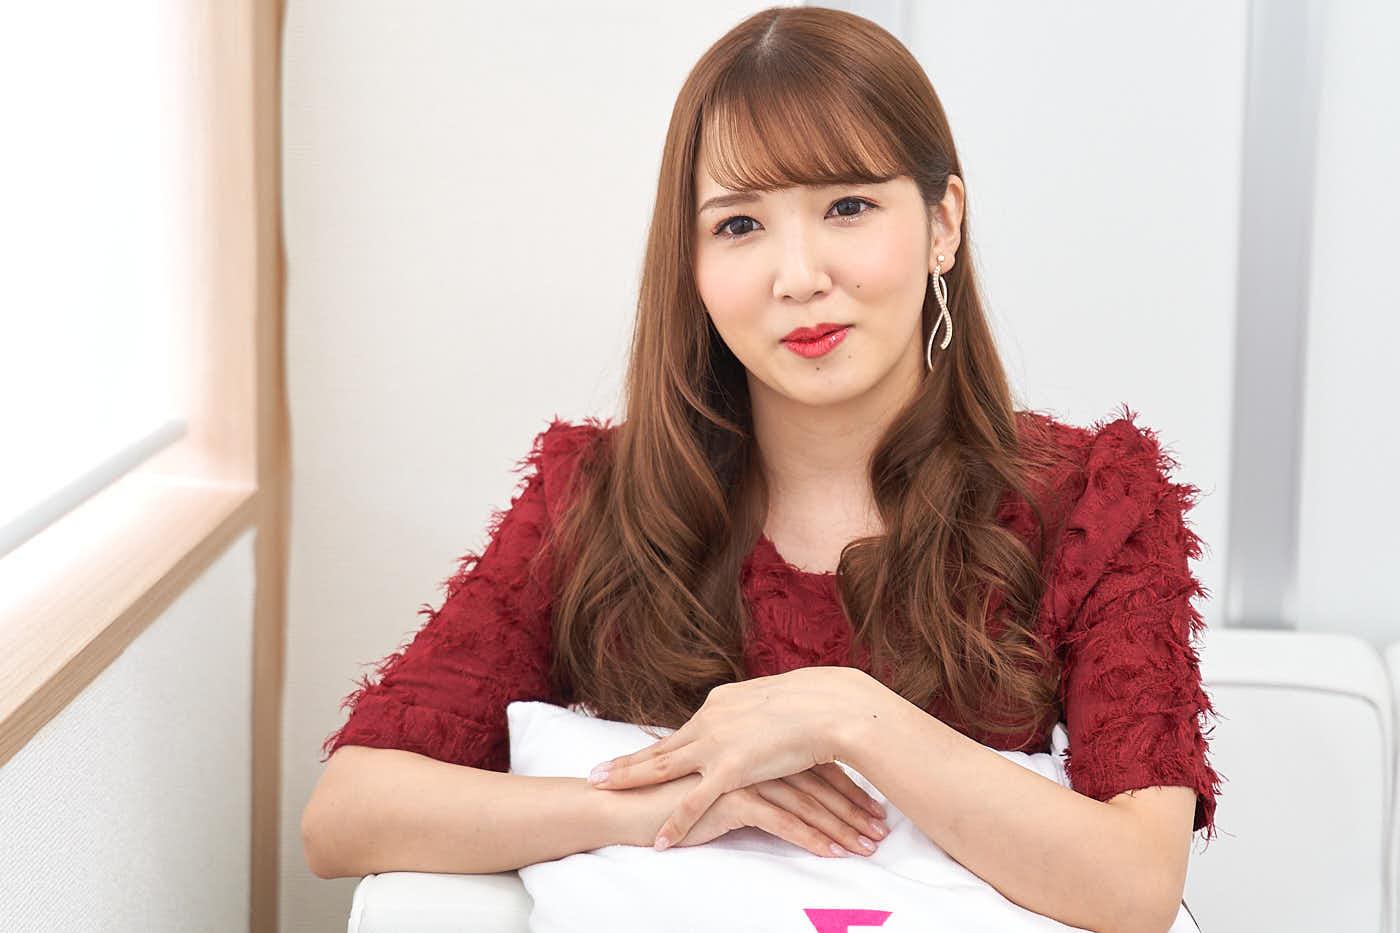 Tomodaayaka27